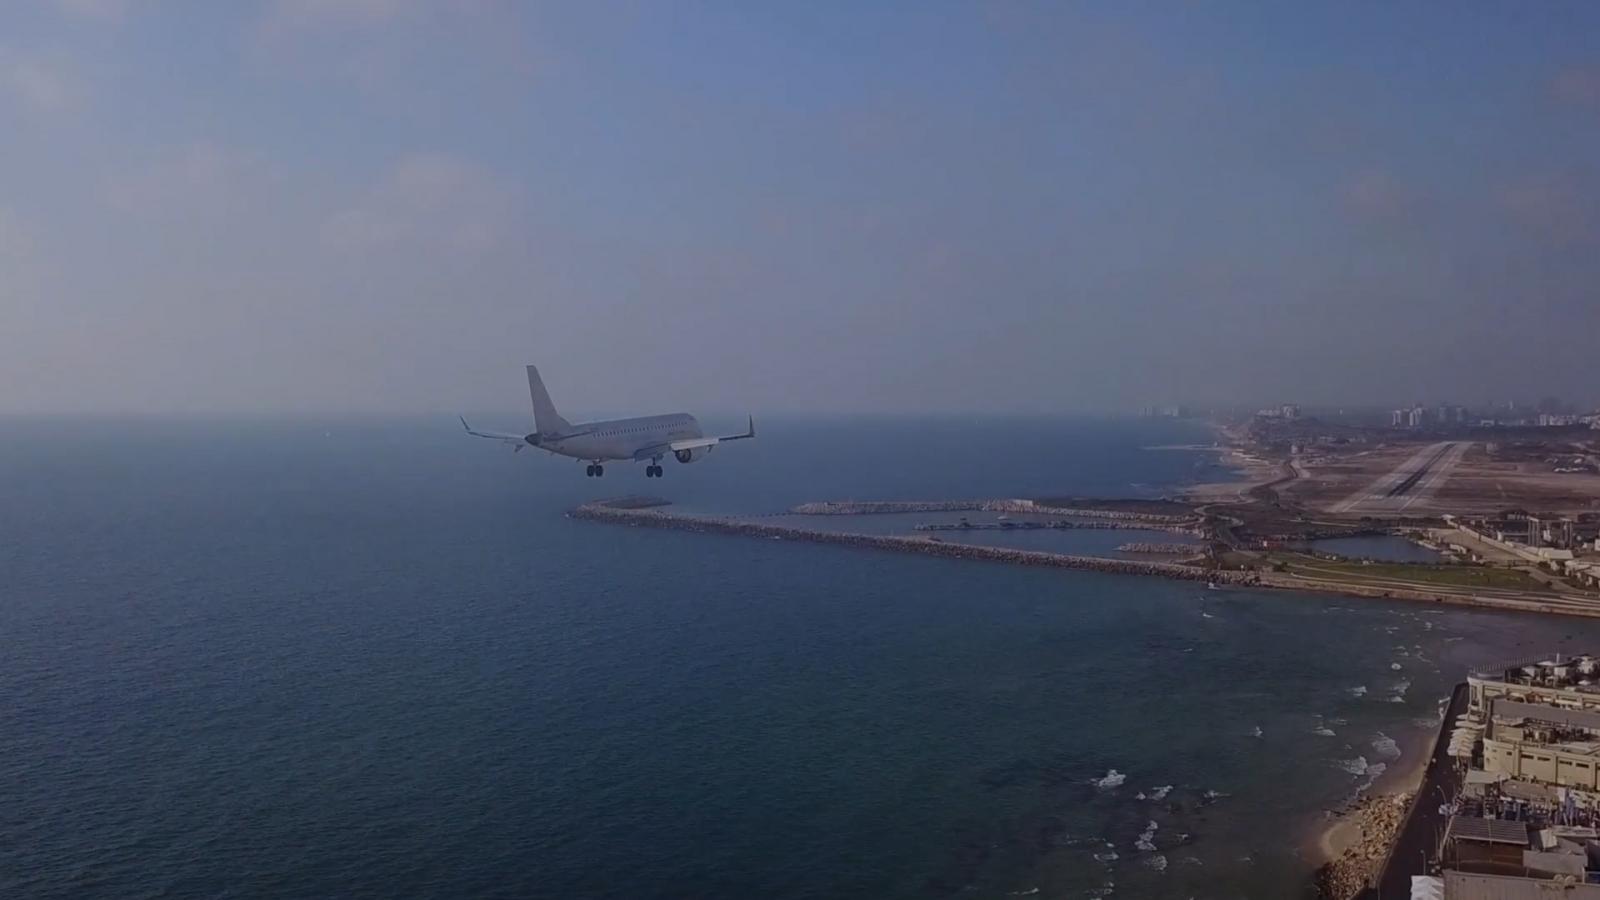 drone-enthusiast-arrested-for-flying-dji-drone-near-tel-aviv-airport-landing-strip